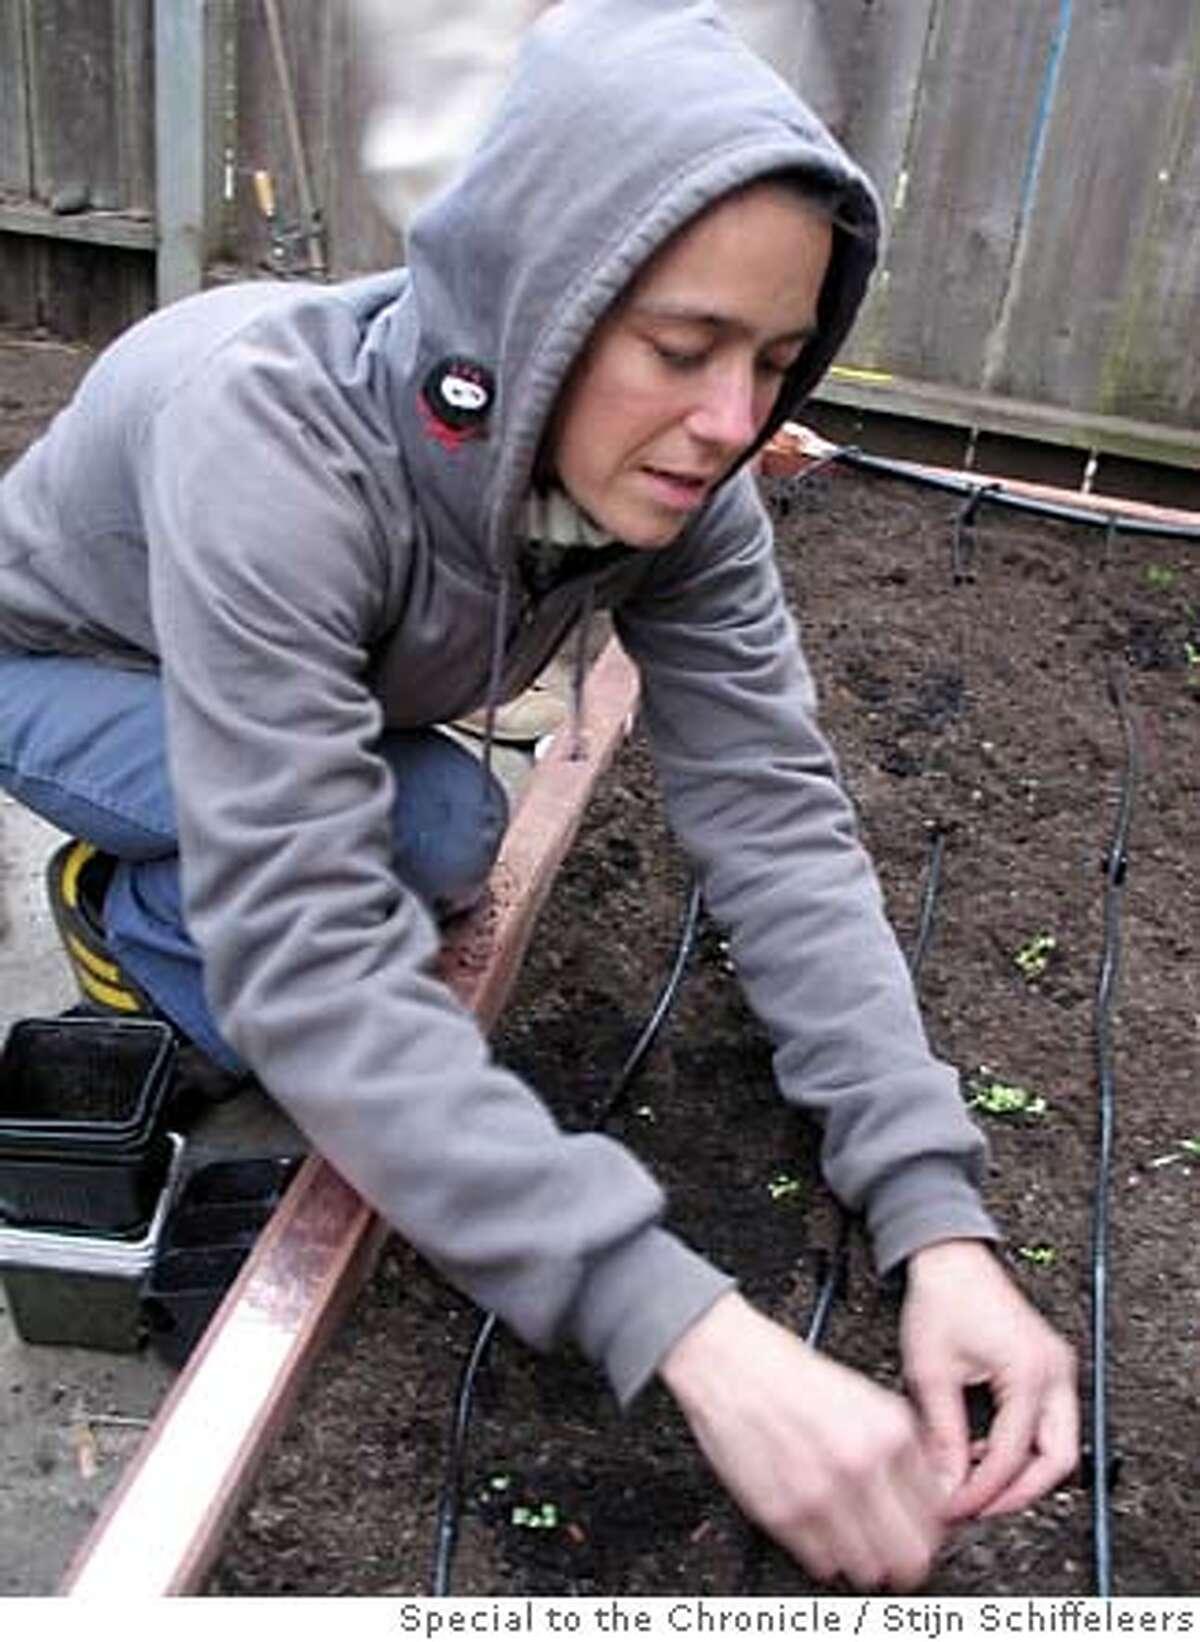 Amy Franceschini at work in the garden.